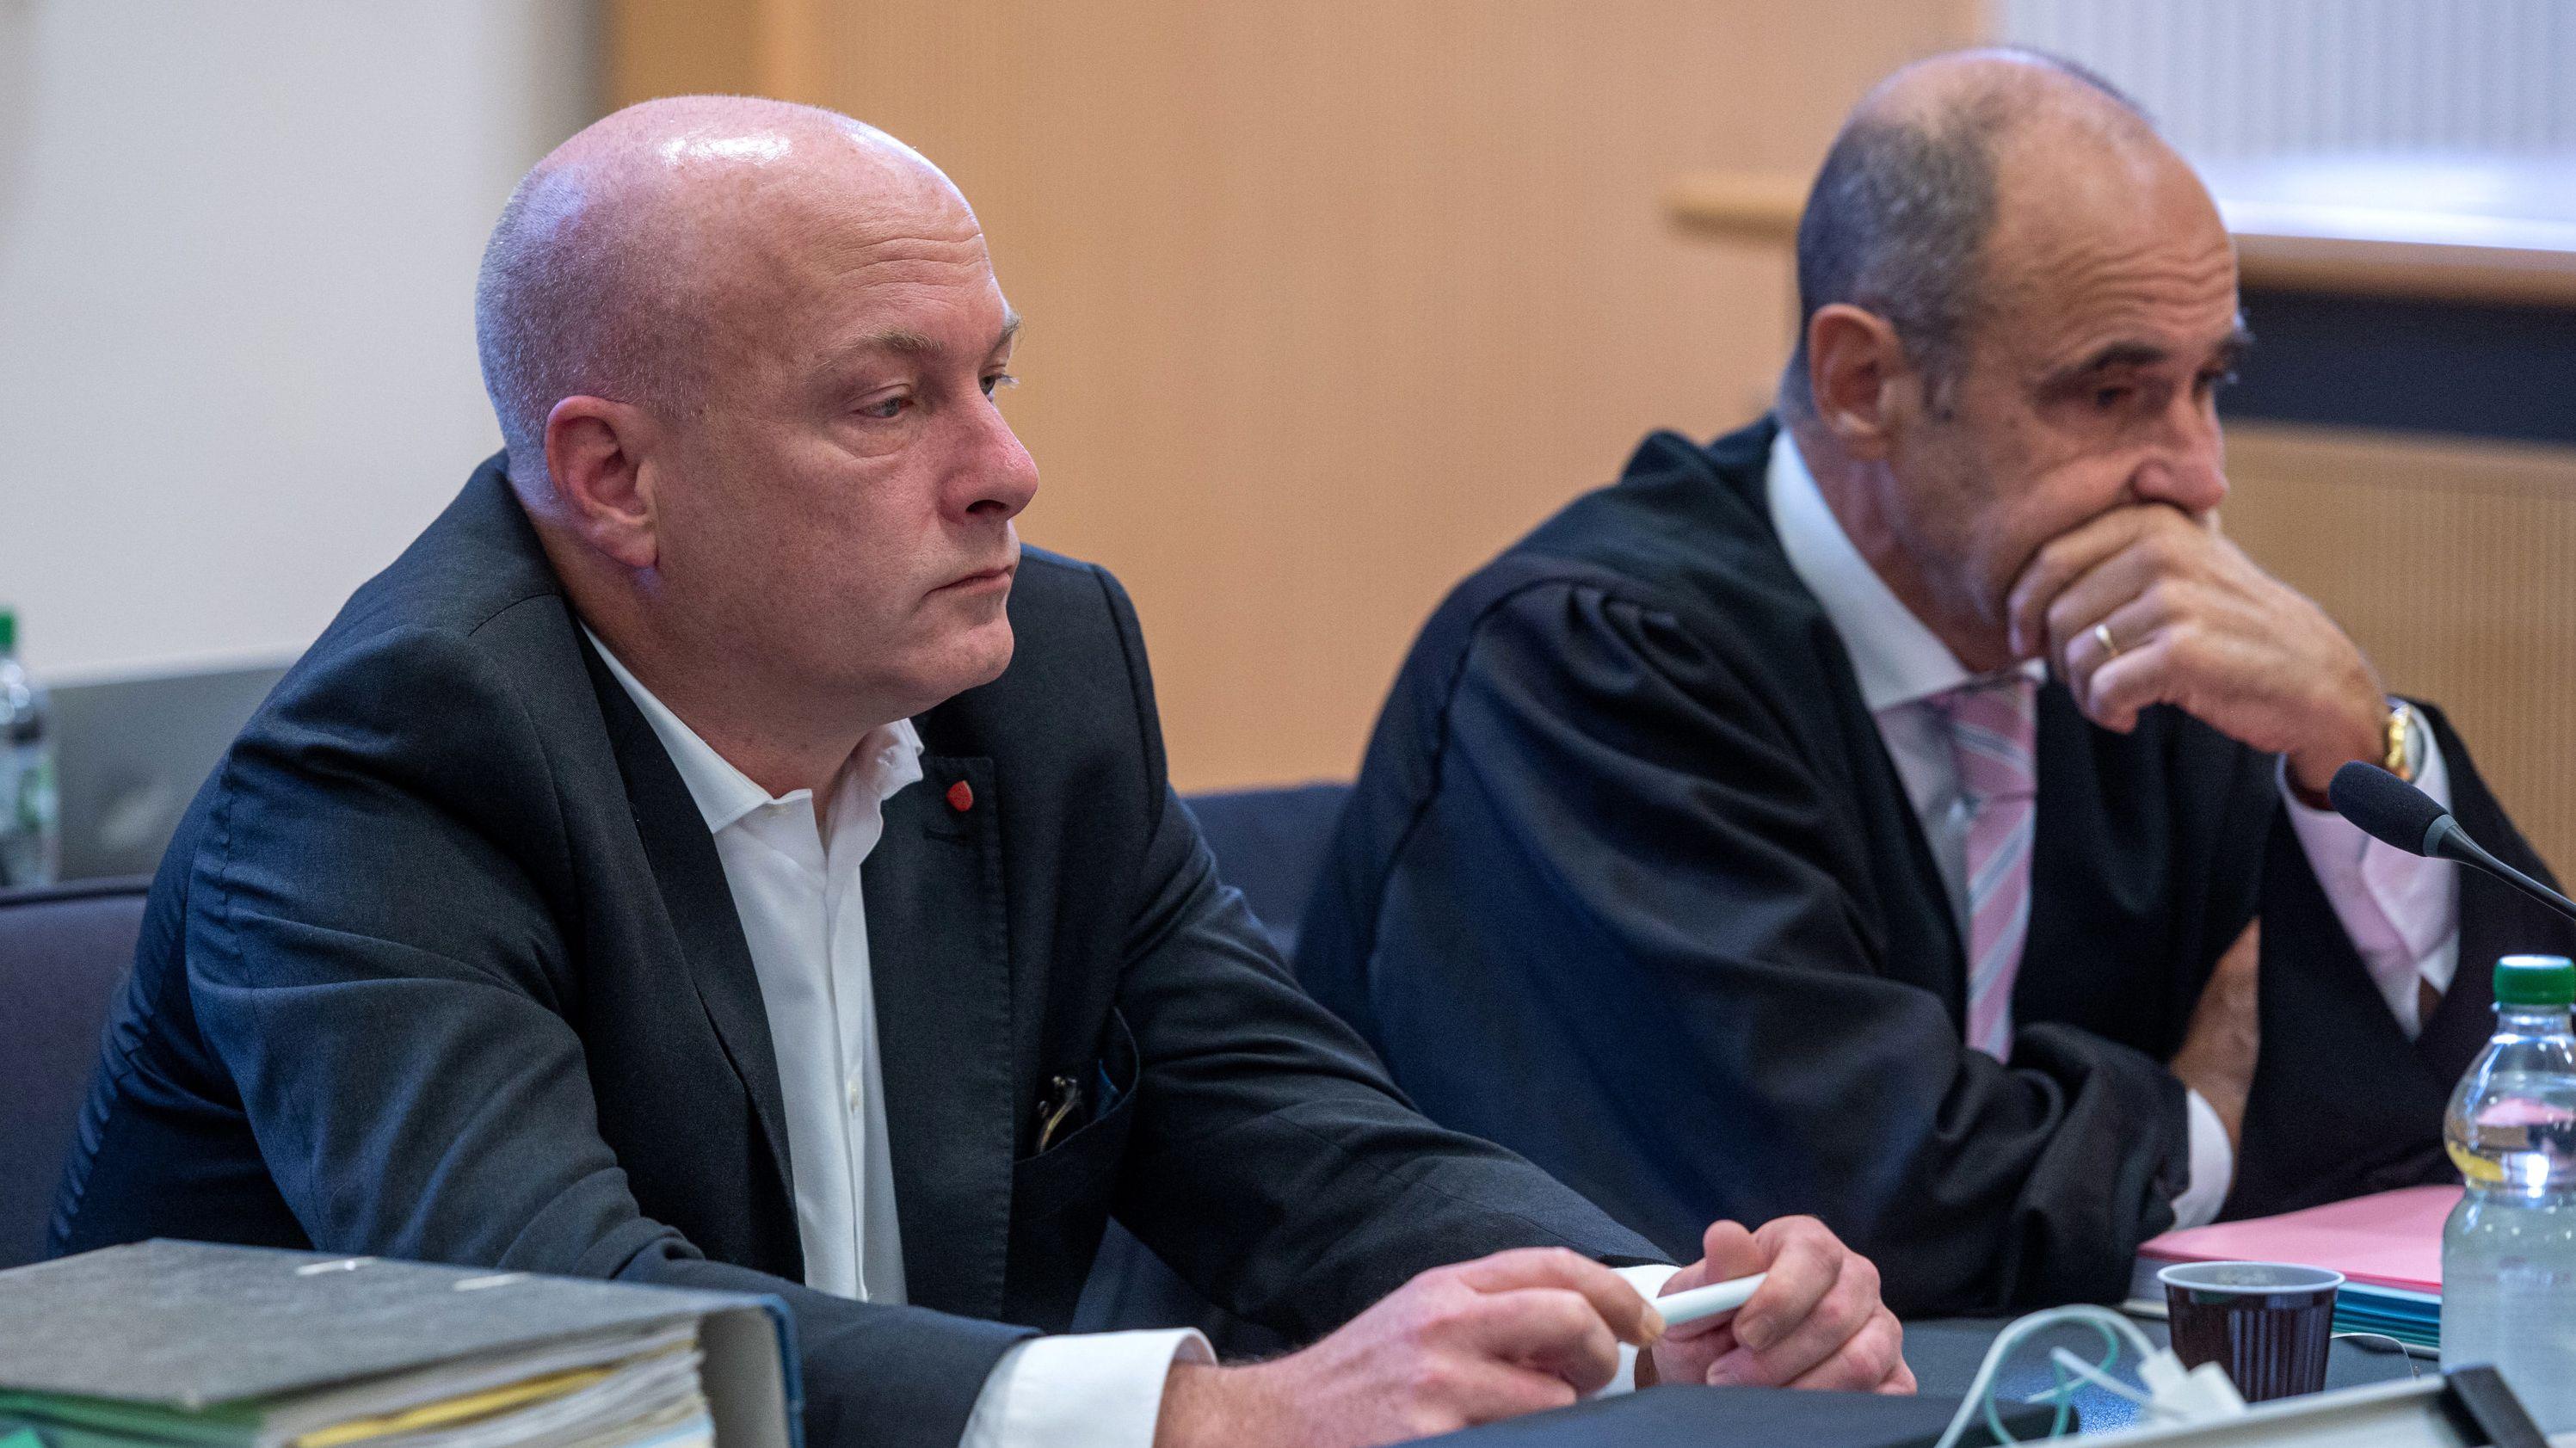 Joachim Wolbergs sitzt im Verhandlungssaal im Landgericht neben seinem Rechtsanwalt Peter Witting.